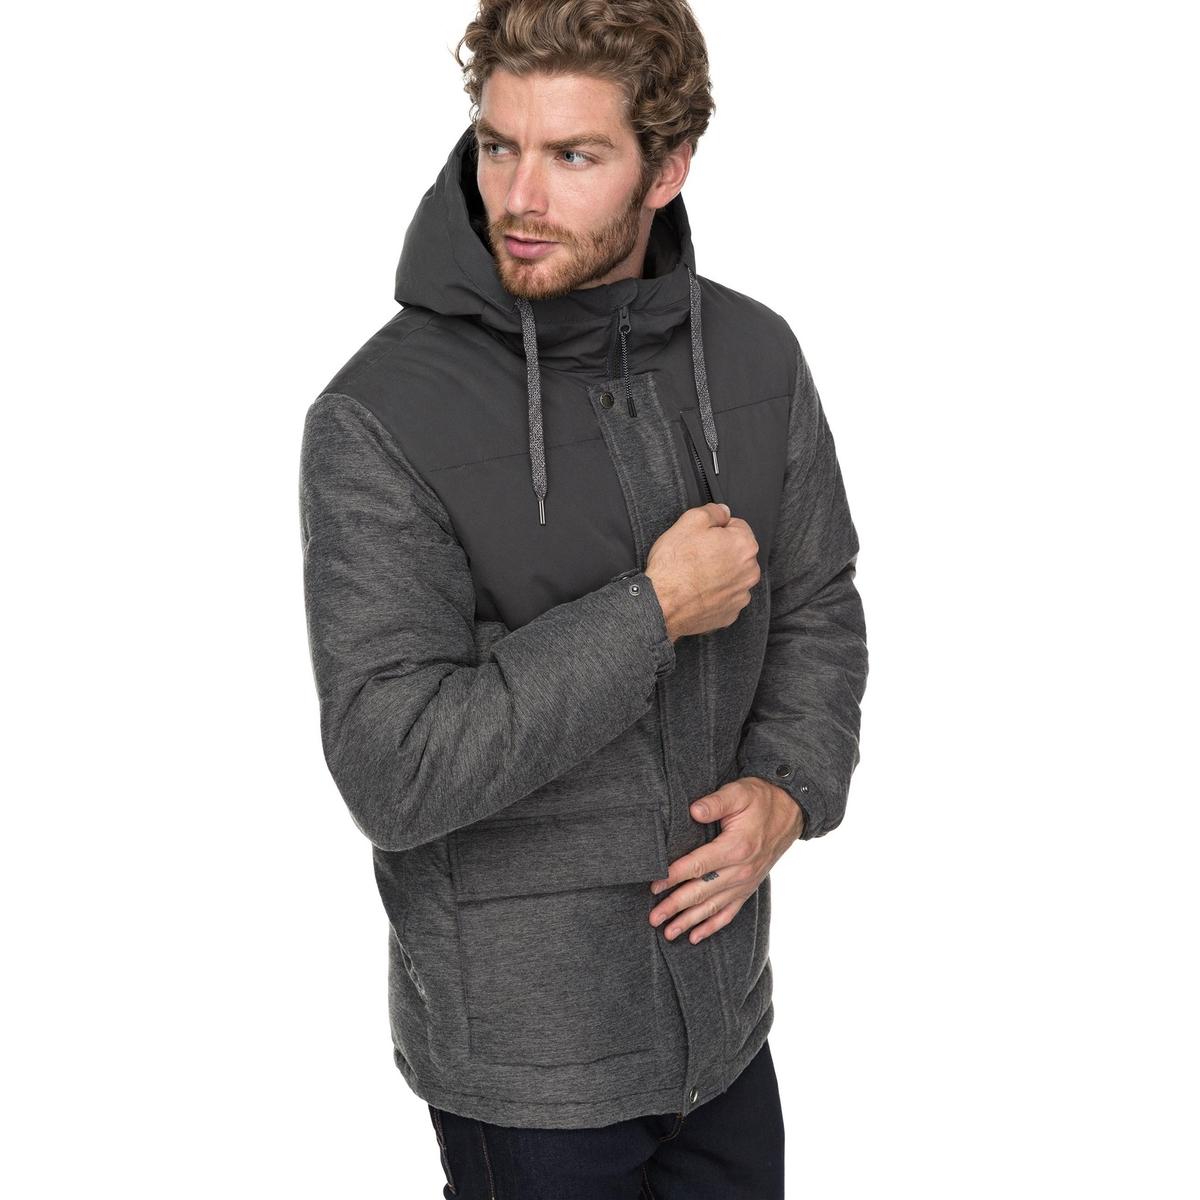 Anorak| Kapuzenfutter Sherpa | Sportbekleidung > Sportmäntel | Grau | Polyester - Taft | QUIKSILVER